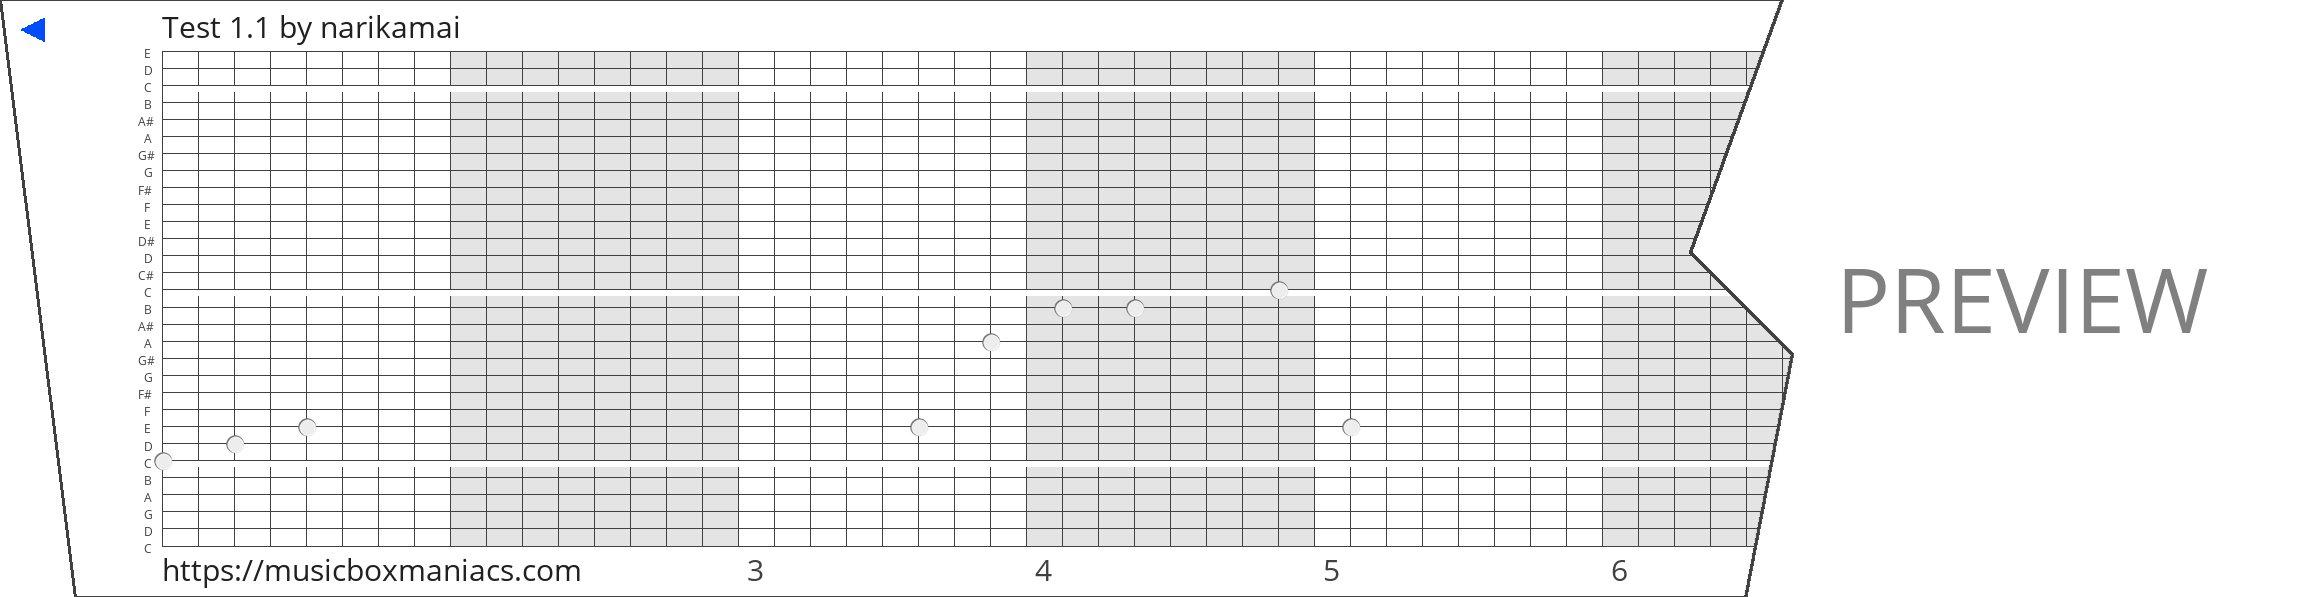 Test 1.1 30 note music box paper strip